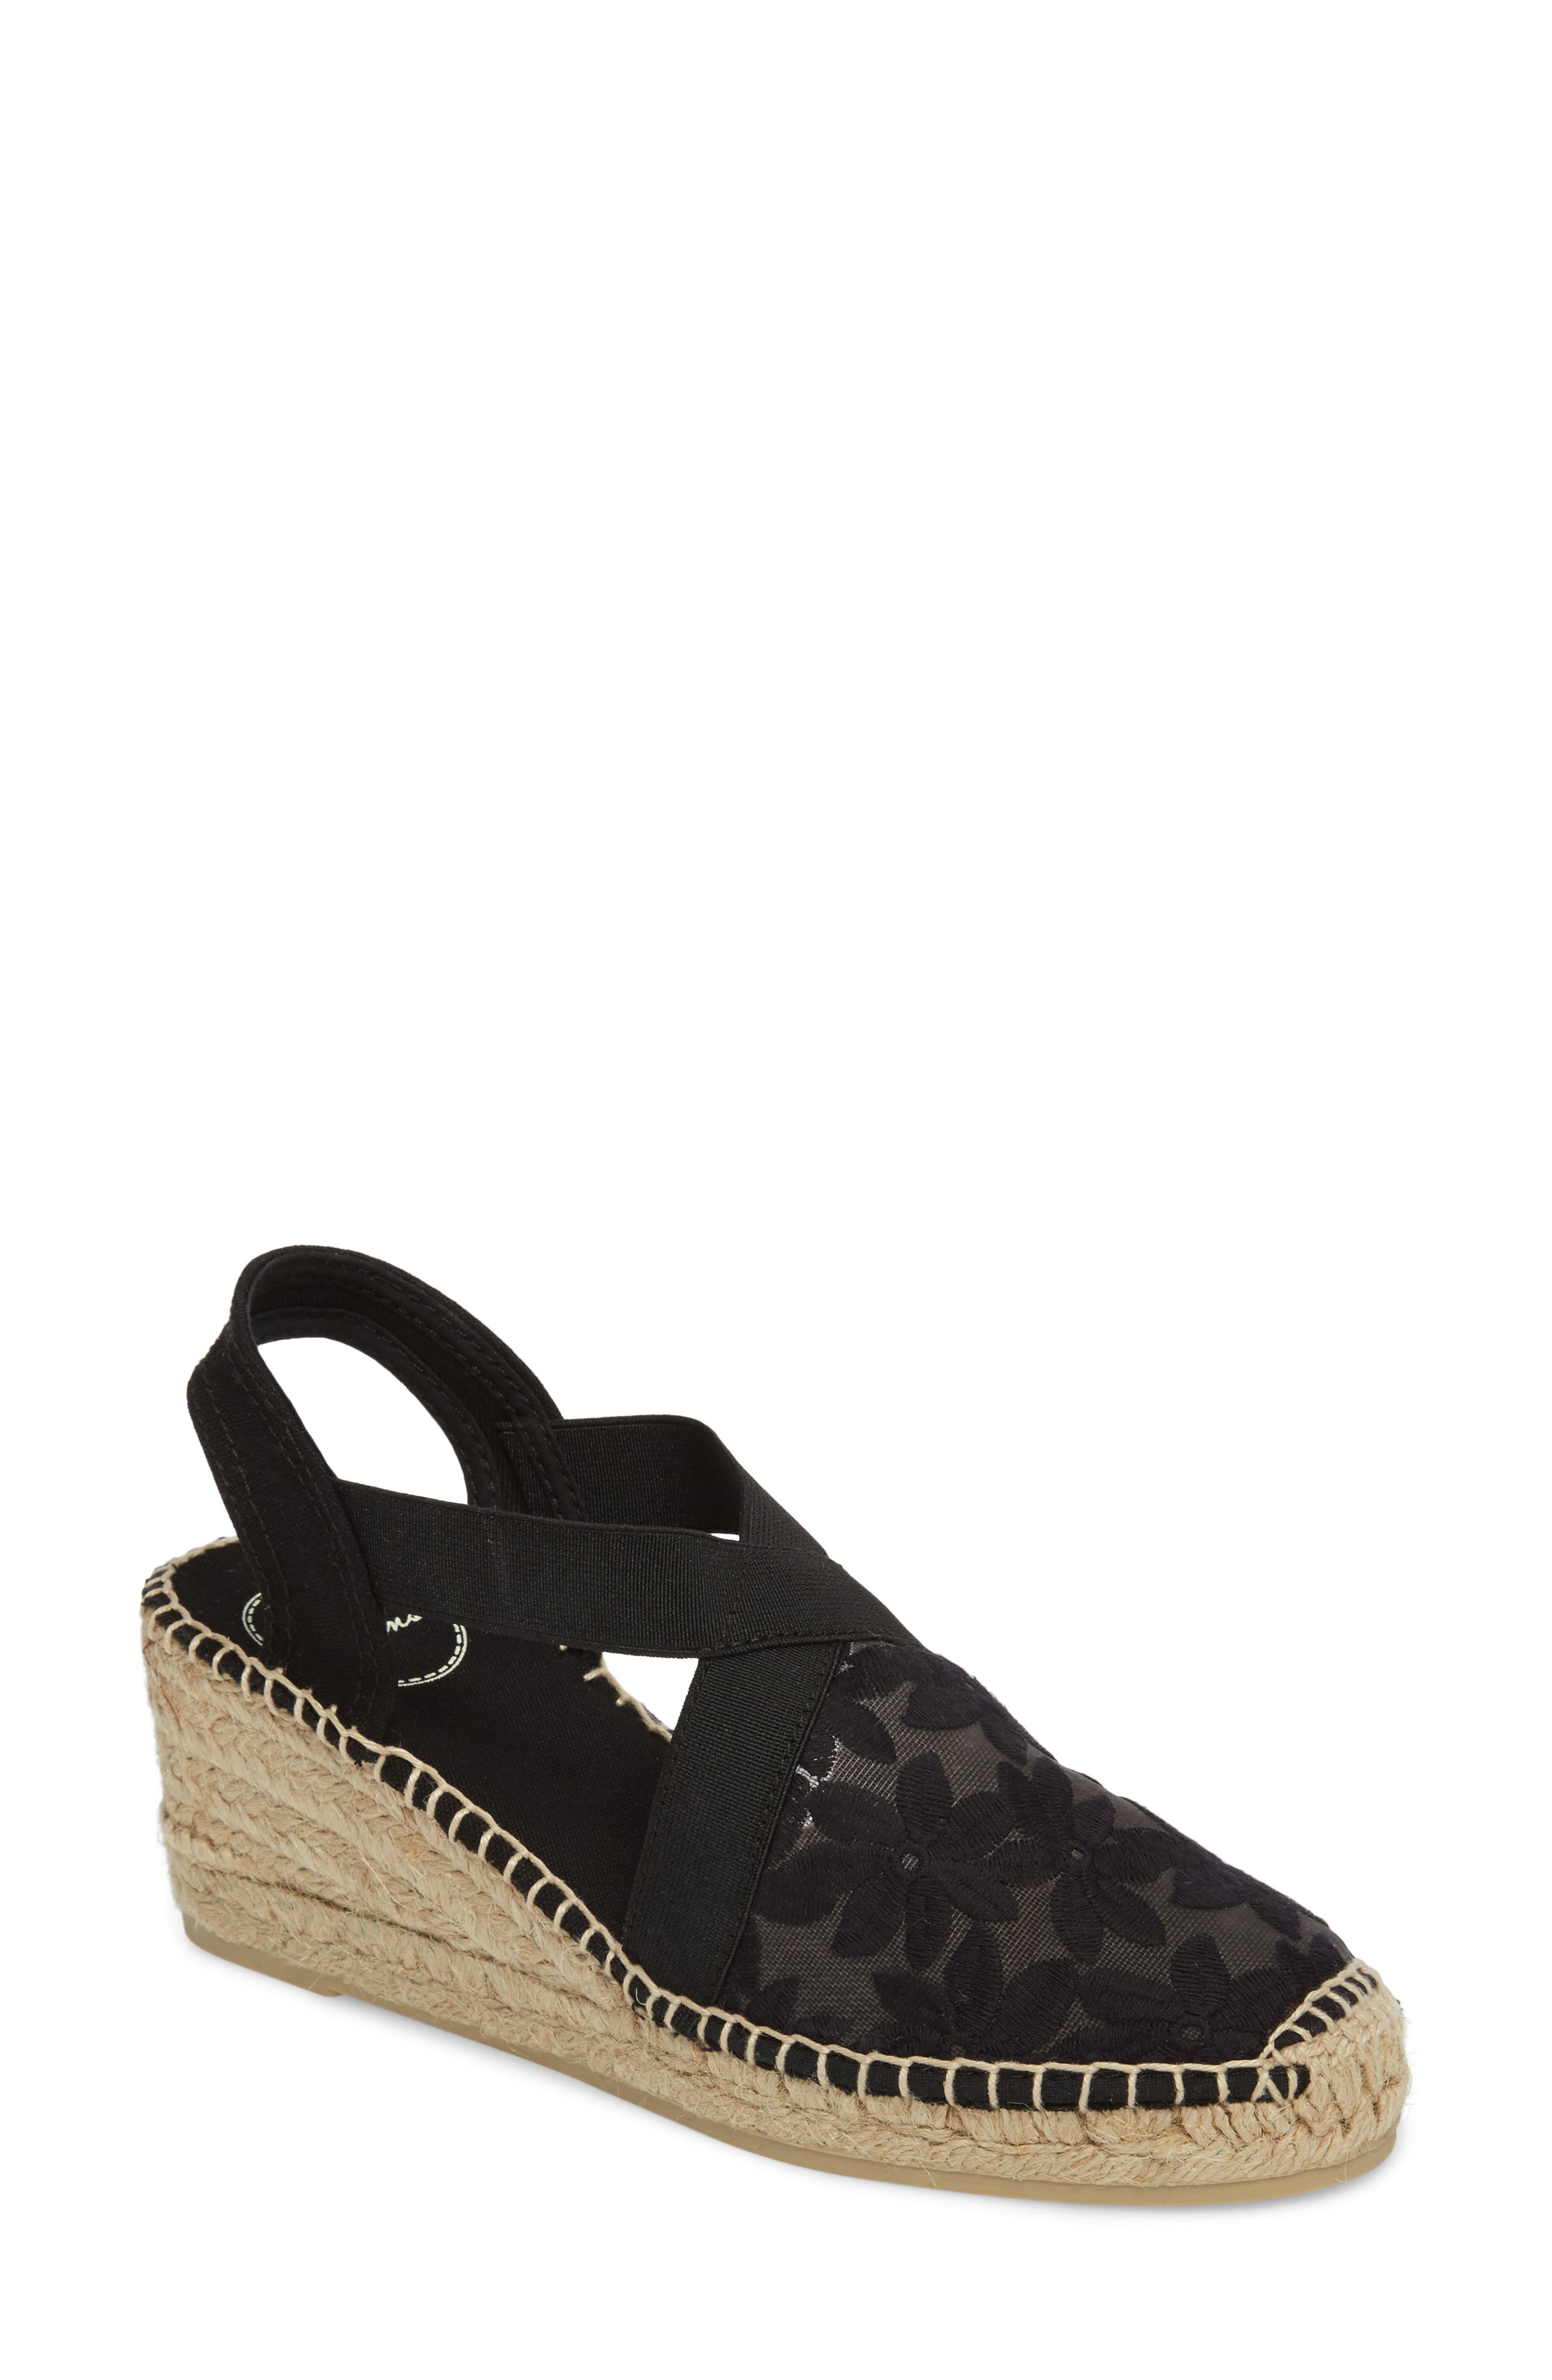 Terra Espadrille Wedge Sandal,                             Main thumbnail 1, color,                             Black Fabric